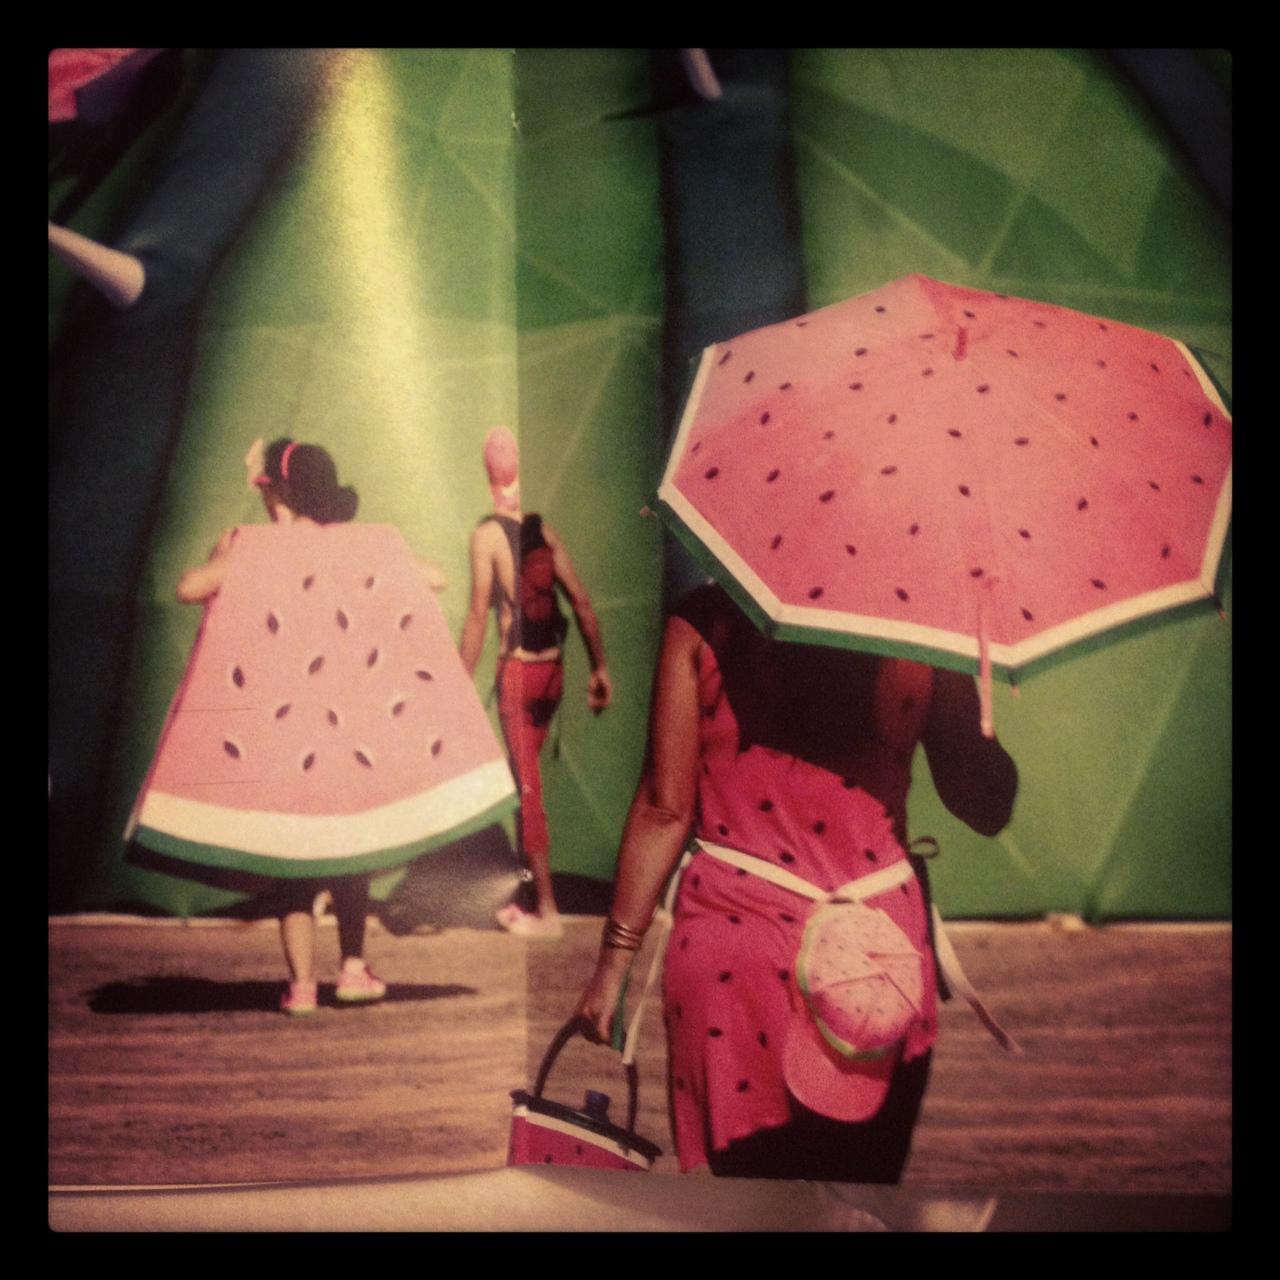 http://1.bp.blogspot.com/-j77UOeFnBl4/T8yvnz3F2-I/AAAAAAAAGCU/1GGgSAWZjaI/s1600/WatermelonObrigado.JPG